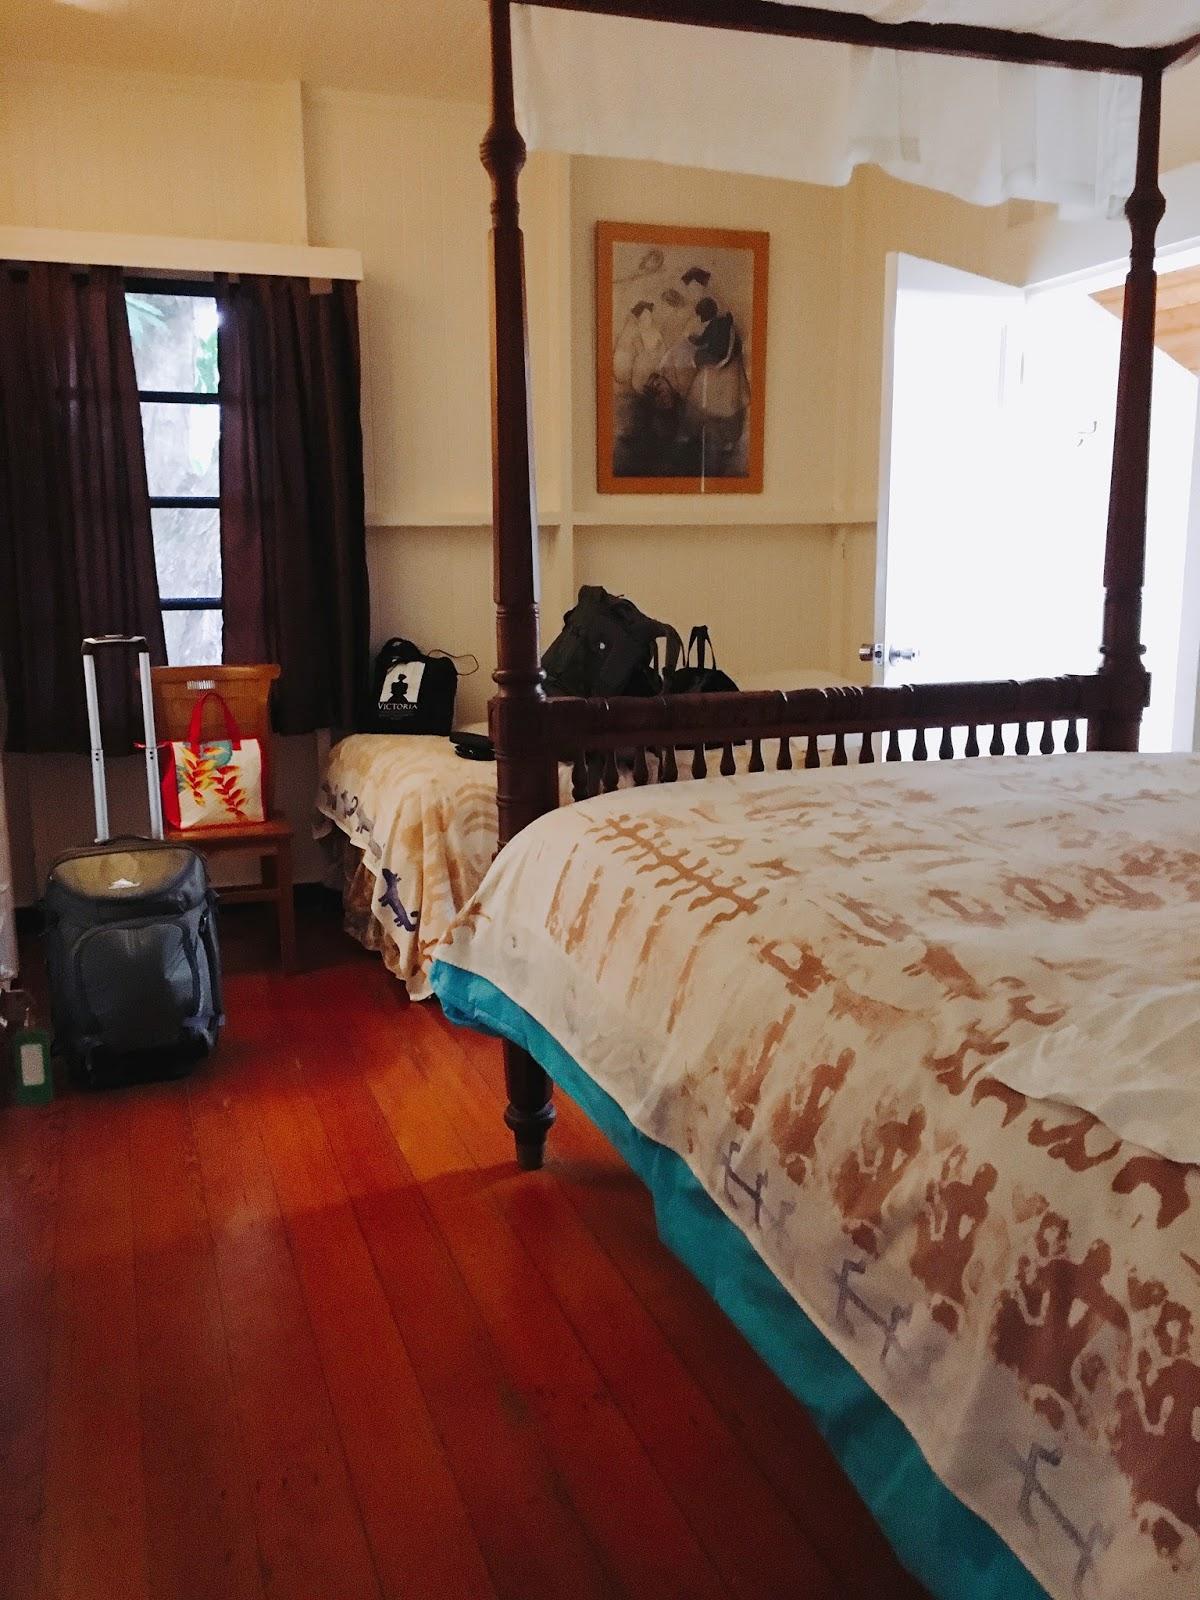 Bedroom 2 at Dreams Come True on Lana'i Island in Hawai'i